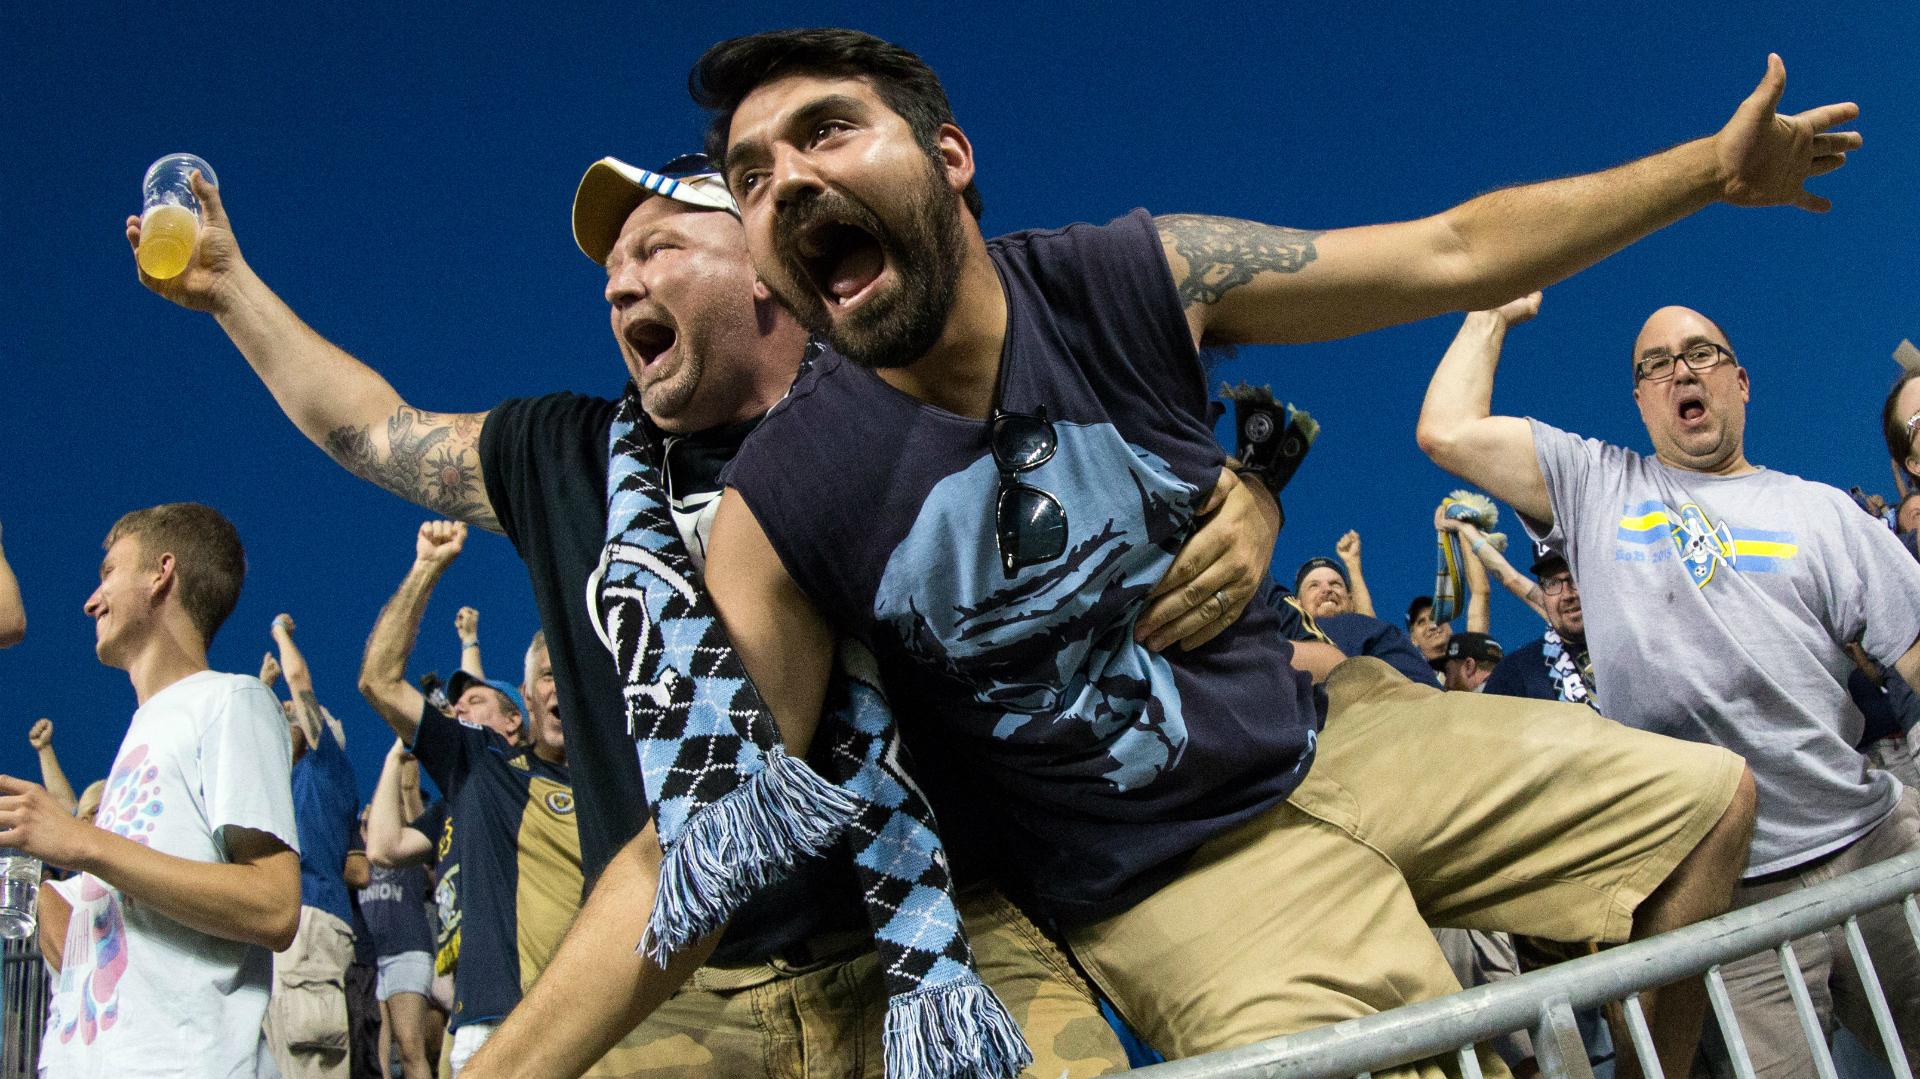 Philadelphia Union fans